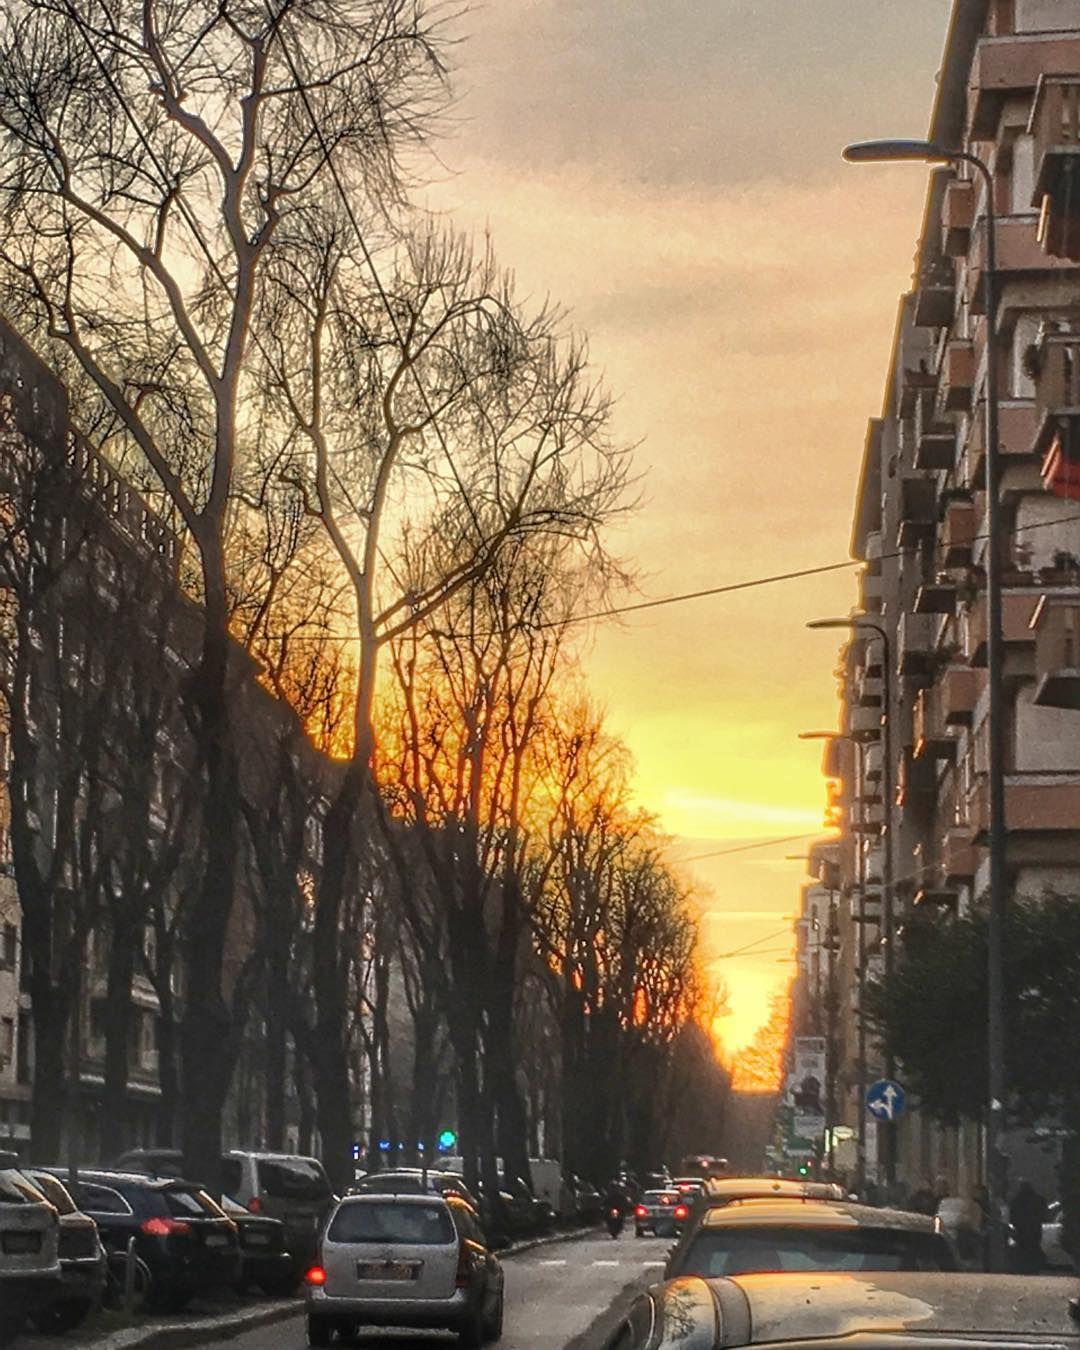 I tramonti pazzeschi di questi giorni  #Milano #milan #sunset #tramonto #tramontirossofuoco #street #trees #january #likeaspringday #instapic #instagood #instamood #vivomilano #volgomilano #top_lombardia_photo #ig_heartshot #igersmilano #ig_milano #milanodaclick #milanodavedere by lamary_diaries